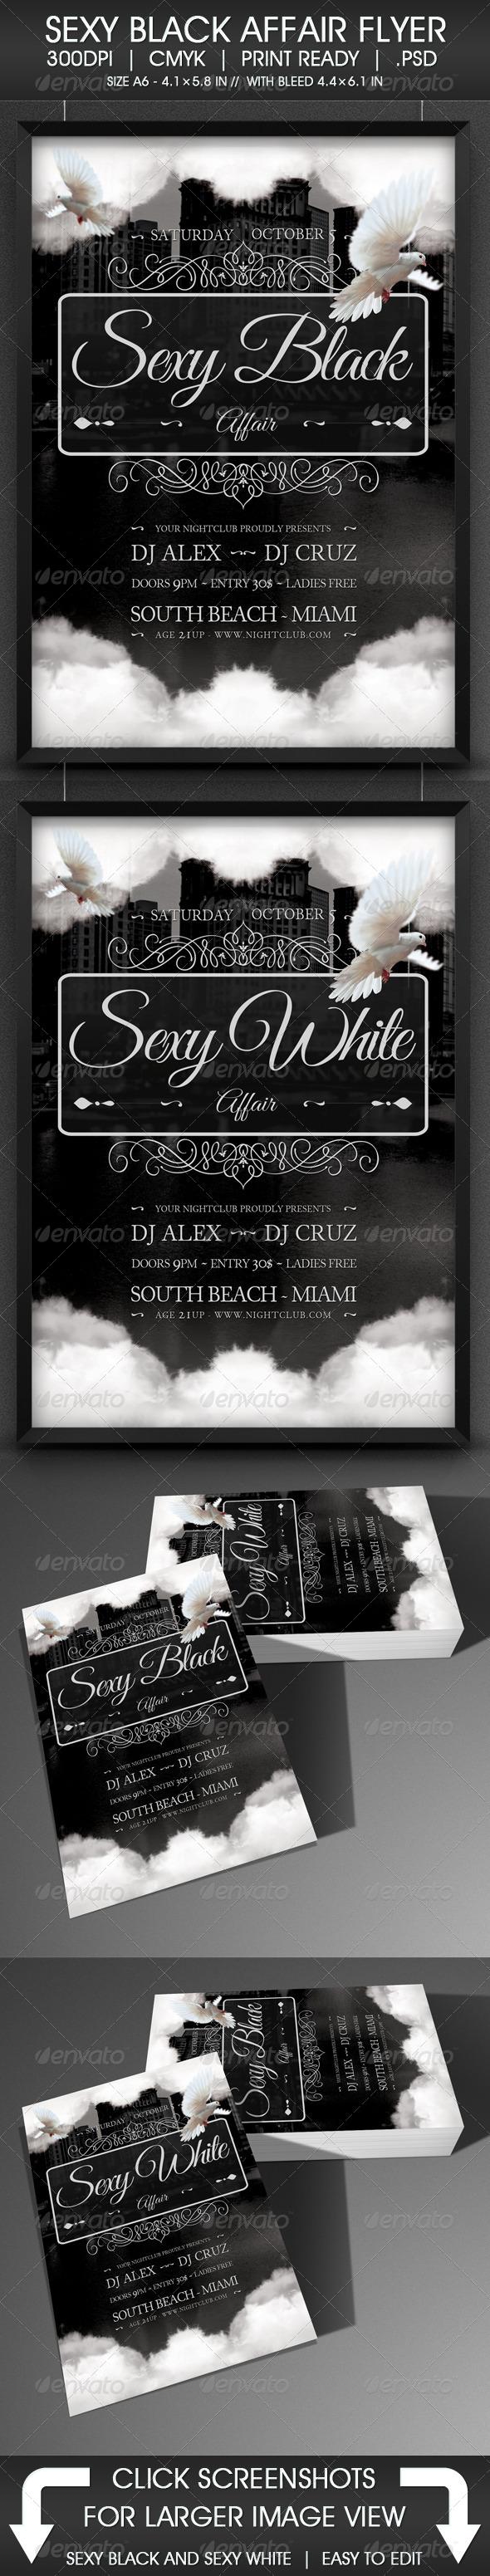 Sexy Black Affair Flyer - Events Flyers